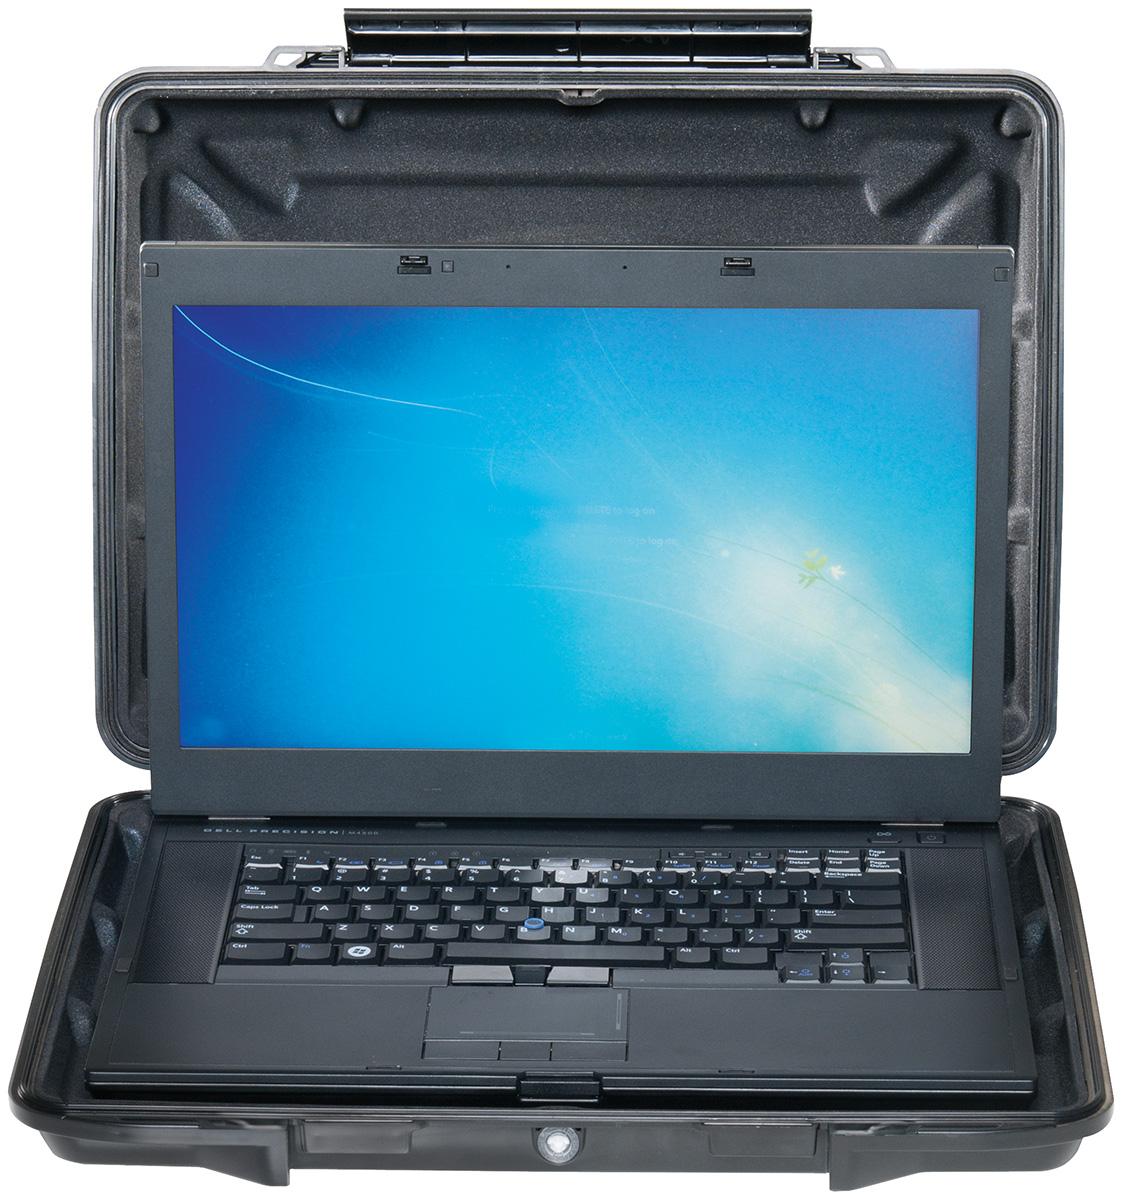 pelican watertight laptop protection case